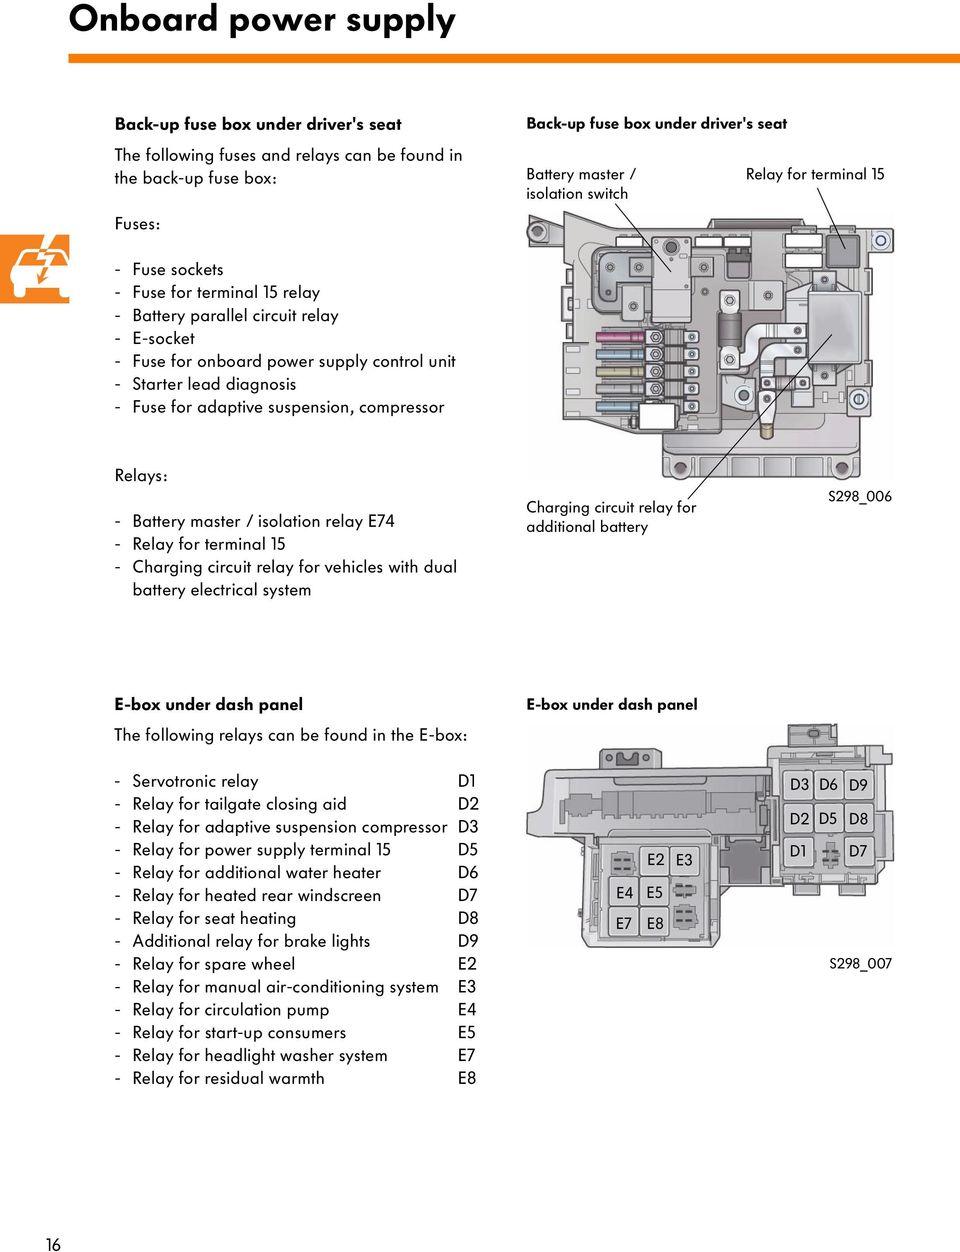 Nissan Urvan Wiring Diagram Pdf Trusted Caravan Audi A3 Fuse Box Auto Electrical 1992 Jeep Wrangler